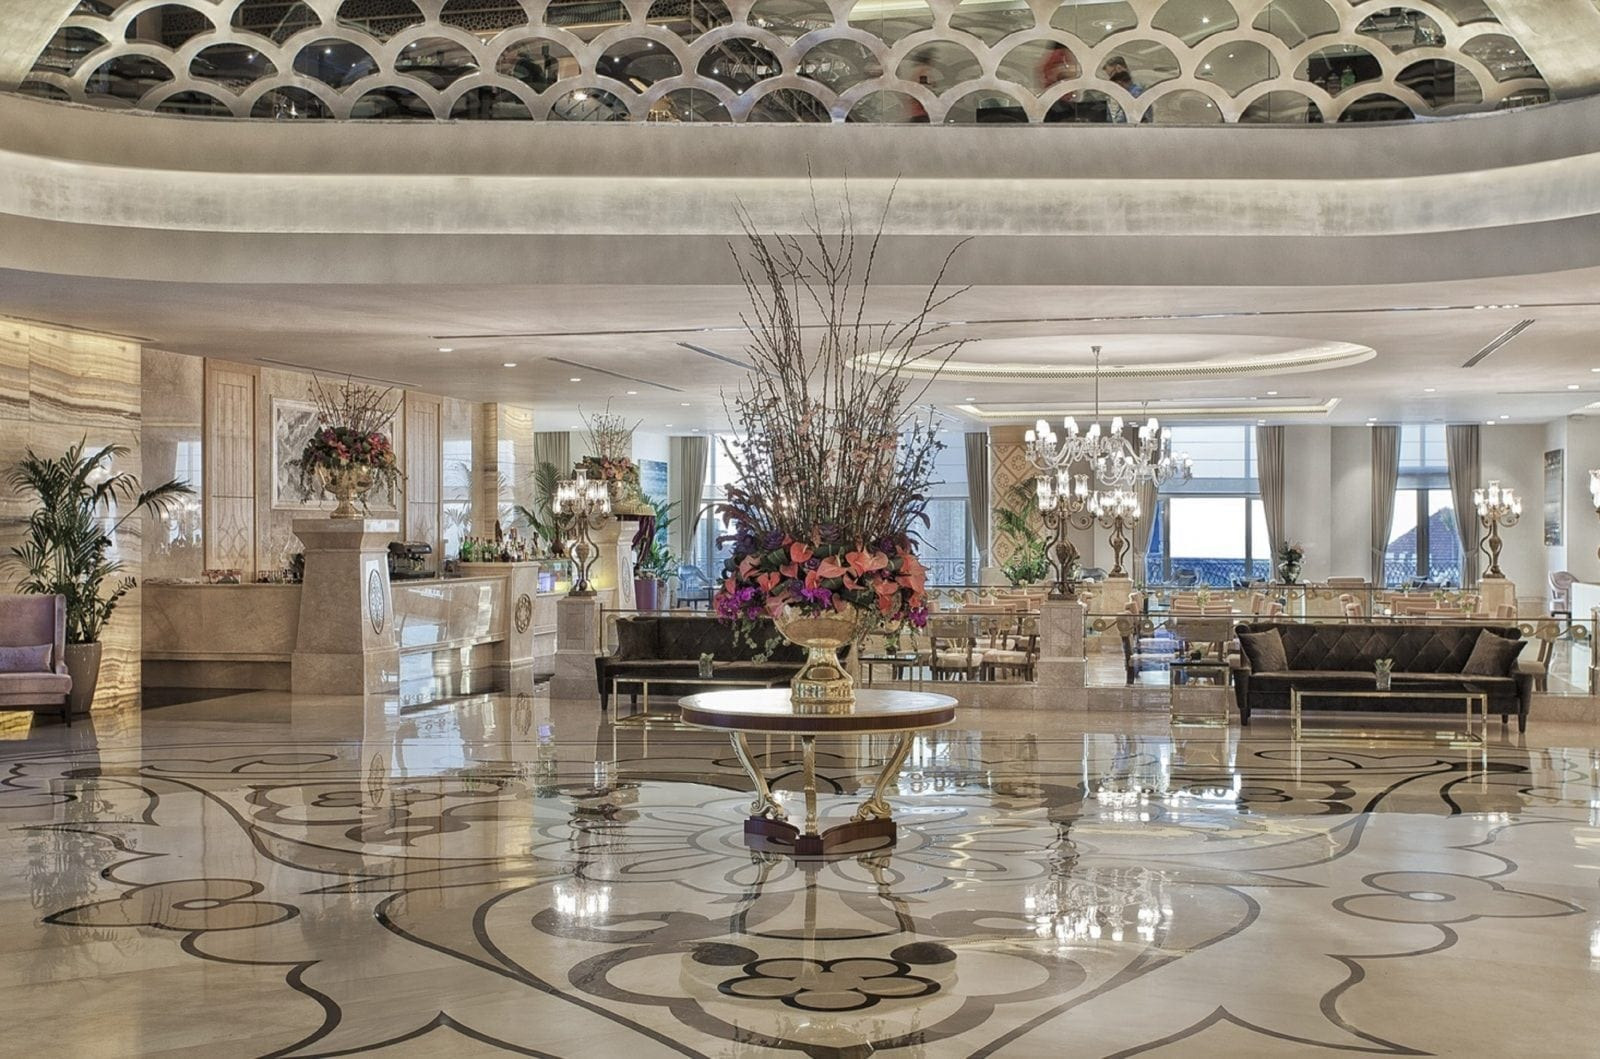 Lobby - Park Bosphorus Hotel Istanbul - reînvie spiritul și tradiția Imperiului Otoman